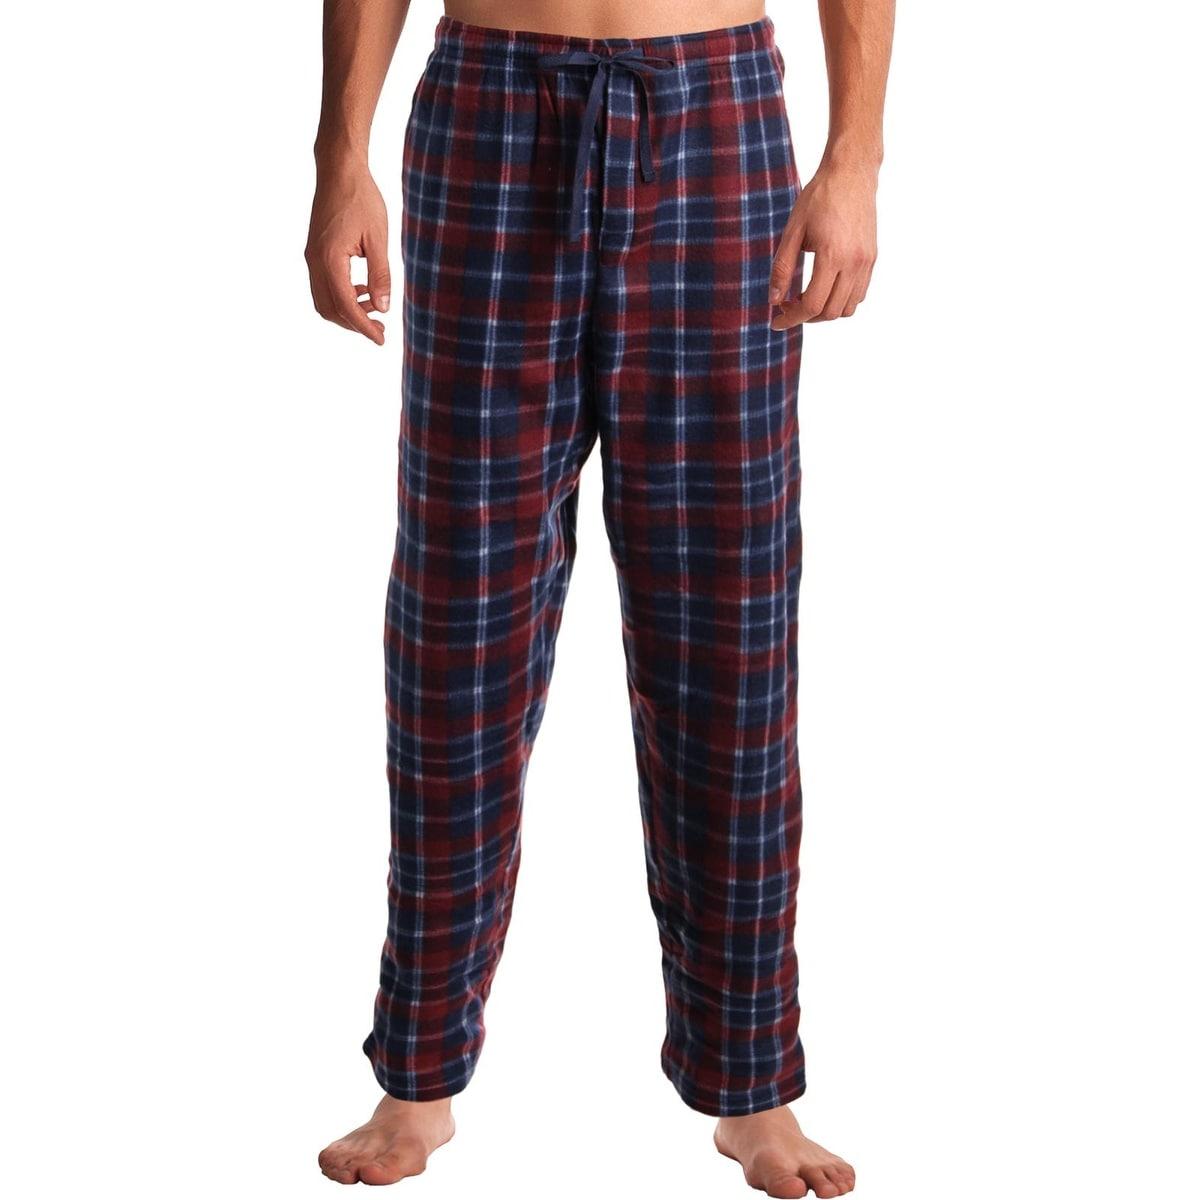 NEW Greg Norman Men/'s Premium V-Neck and Pants Lounge Set Size 2XL